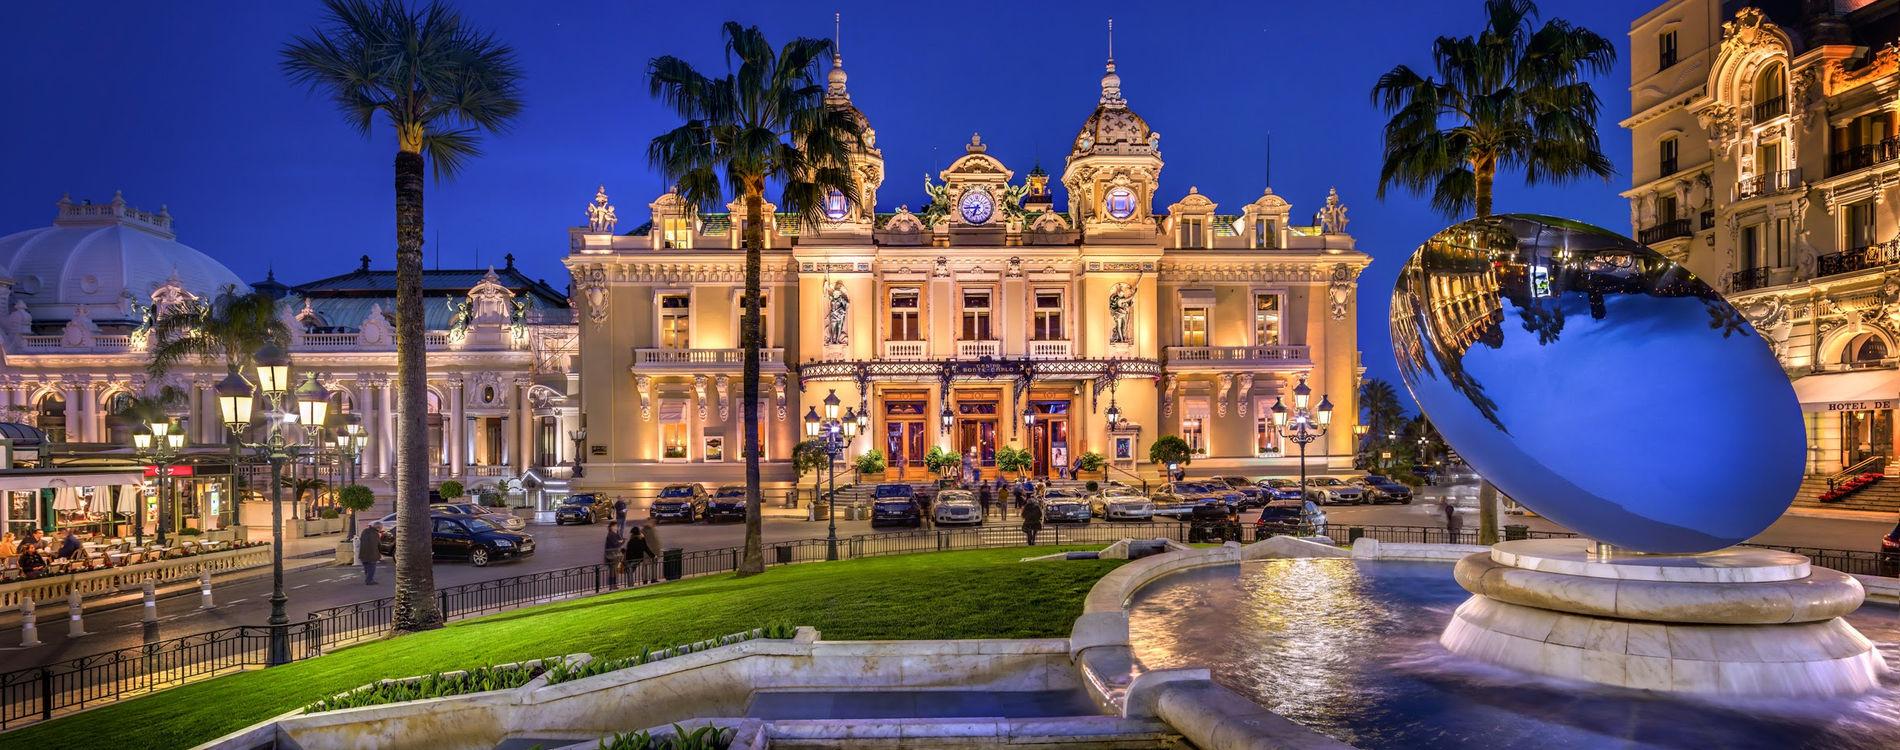 Casino de Monte-Carlo - Façade de nuit